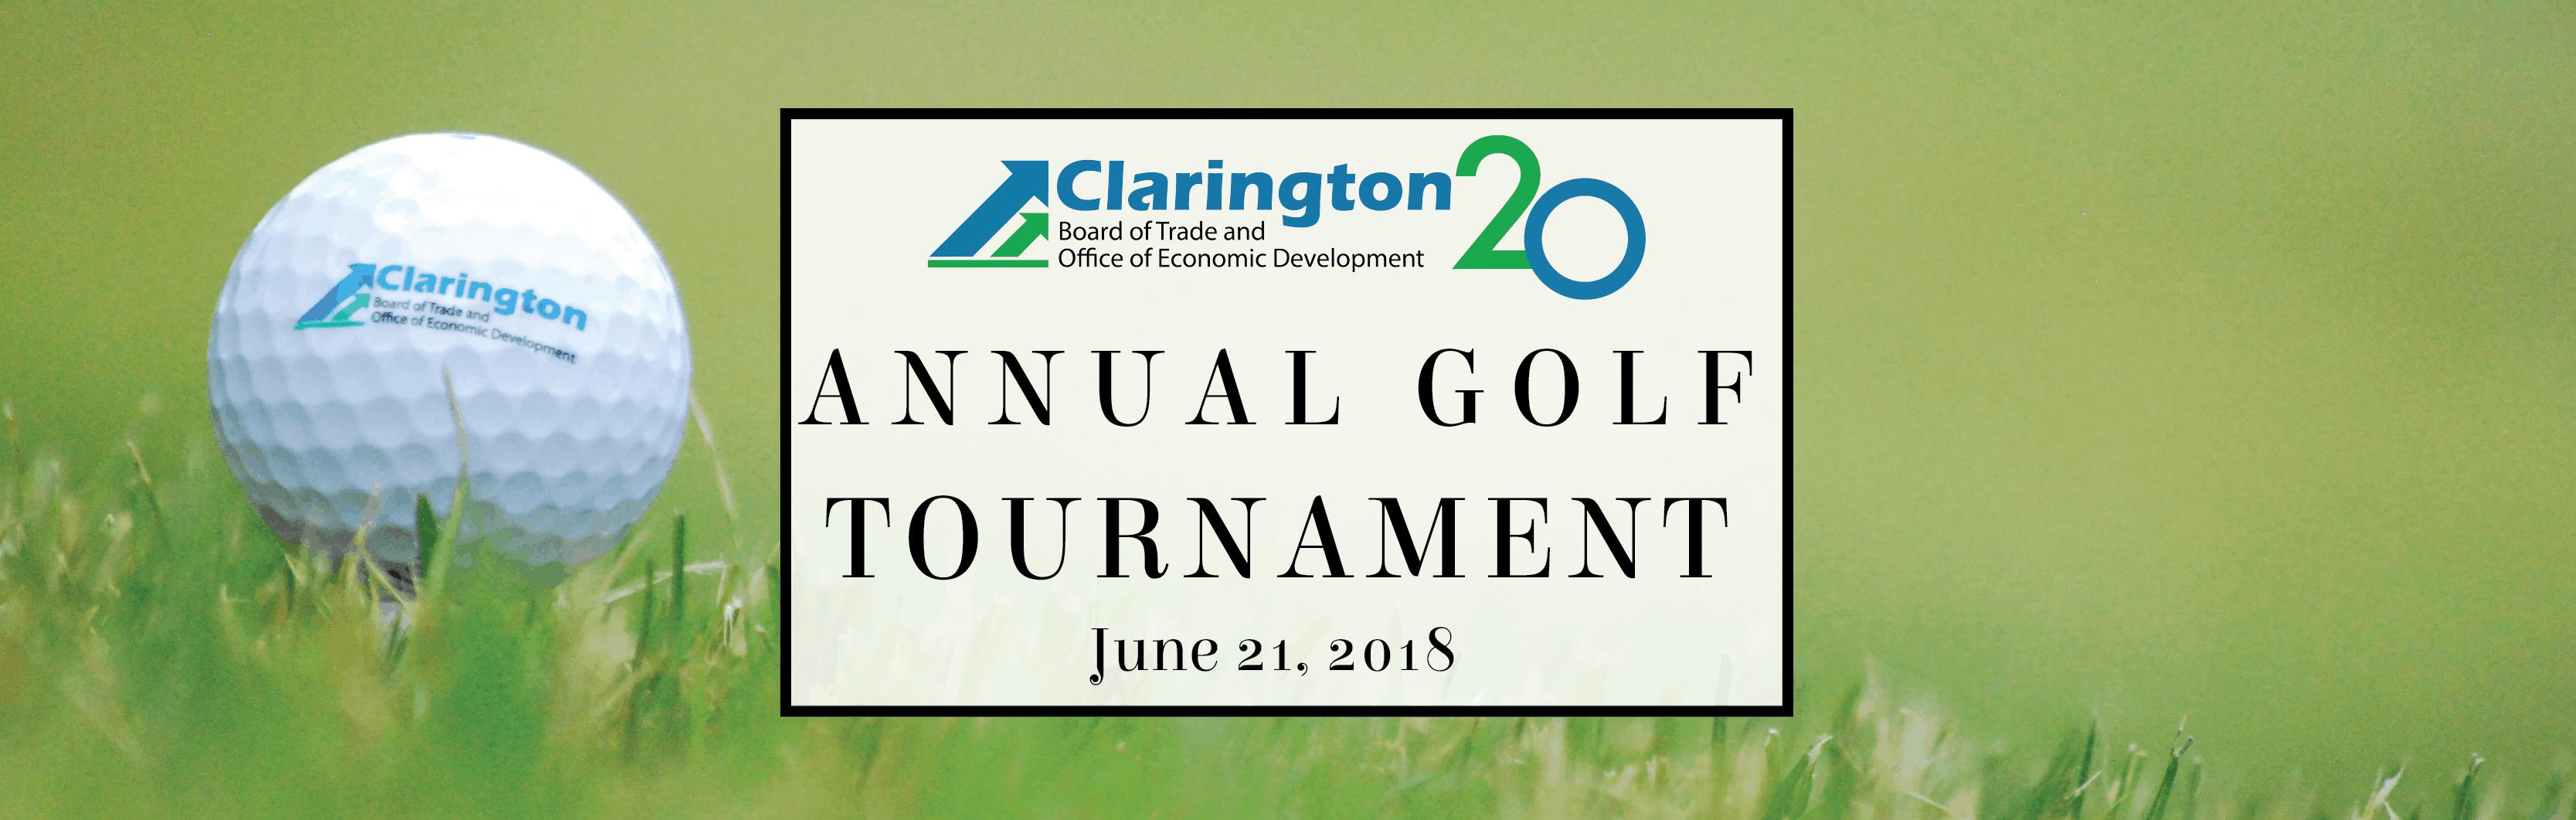 CBOT's Annual Golf Tournament